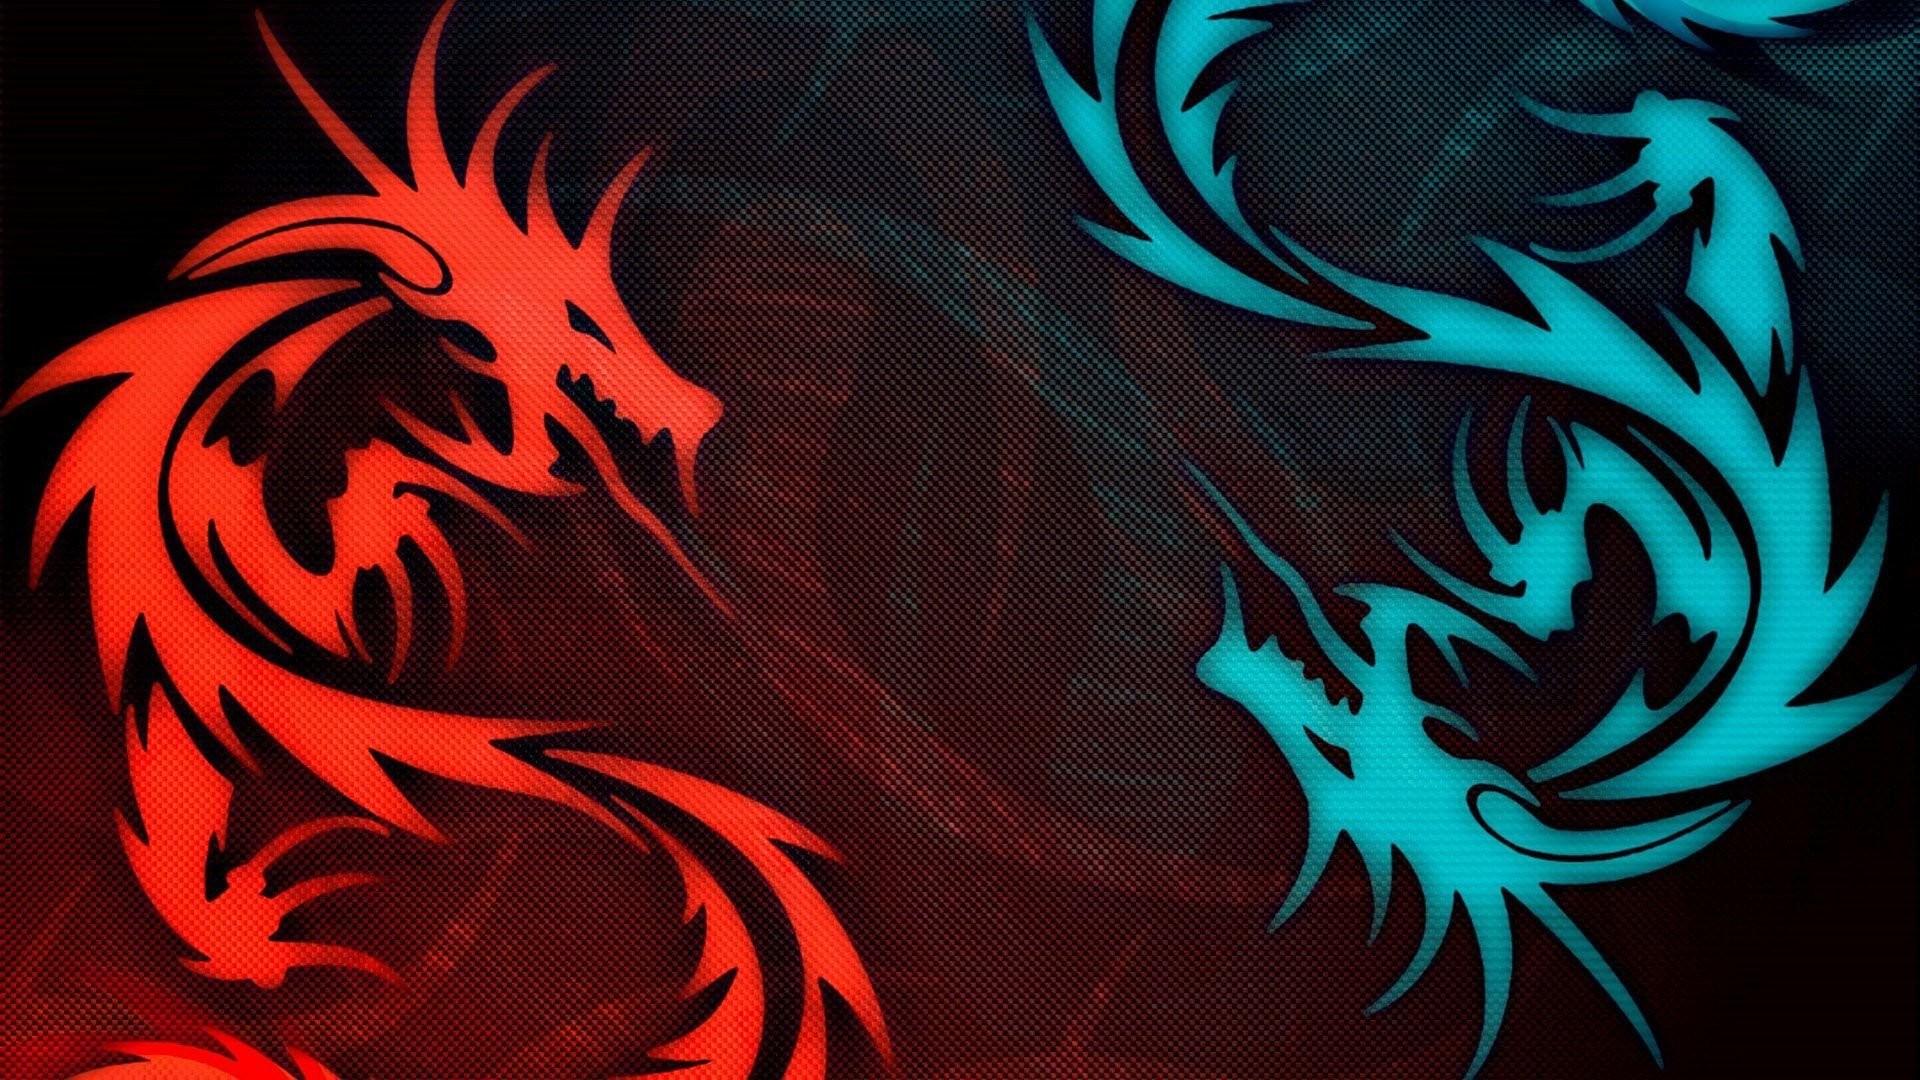 Msi Gaming Dragon Wallpaper 86 Images